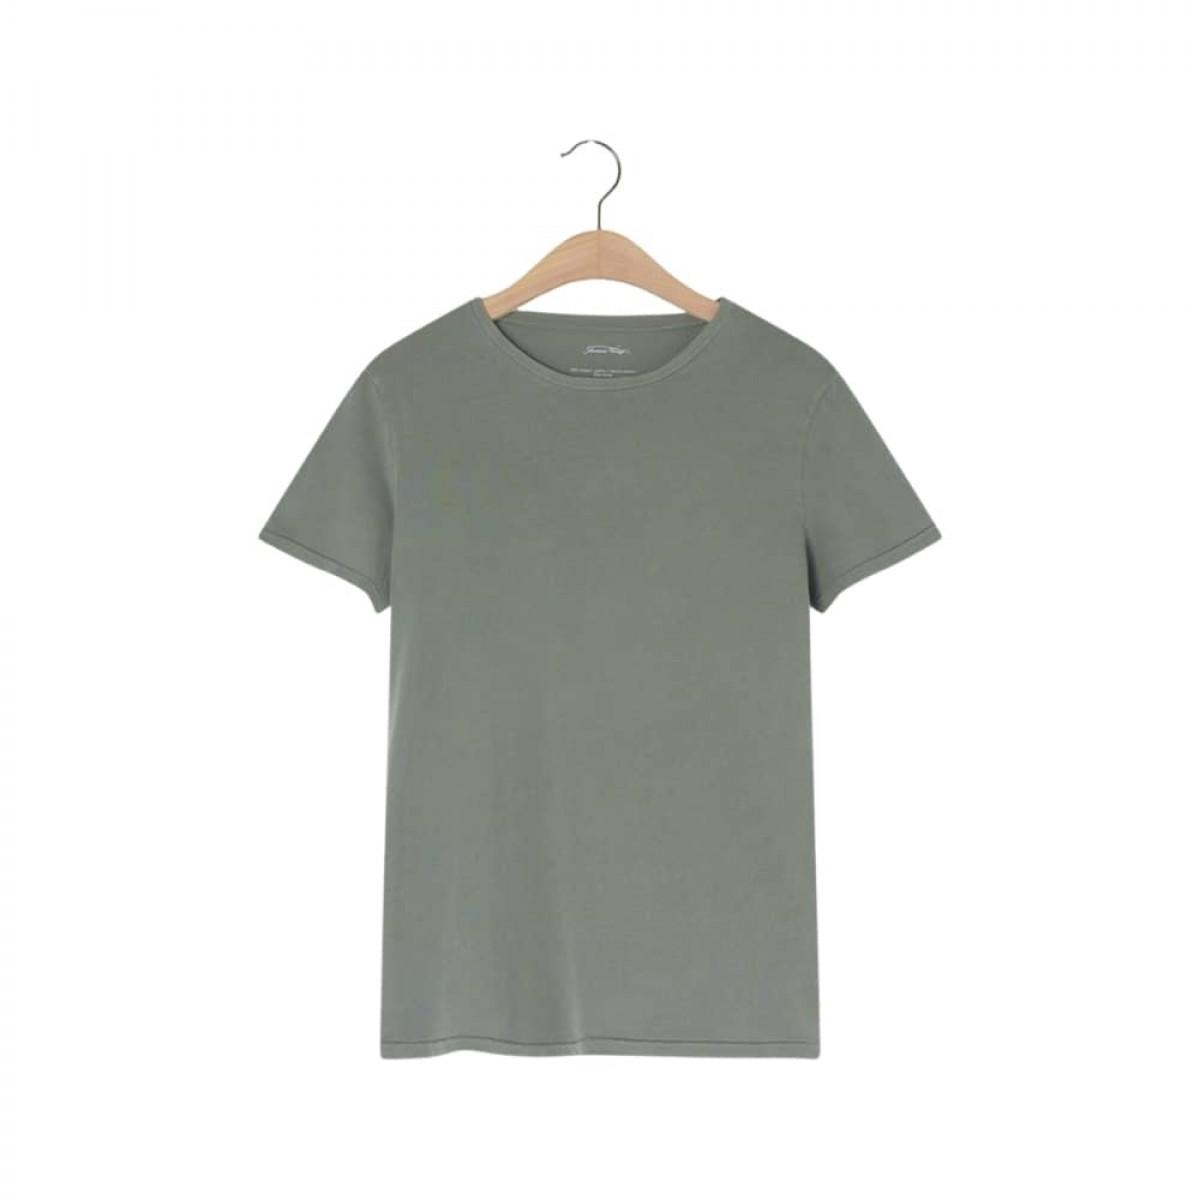 vegiflower t-shirt - olive